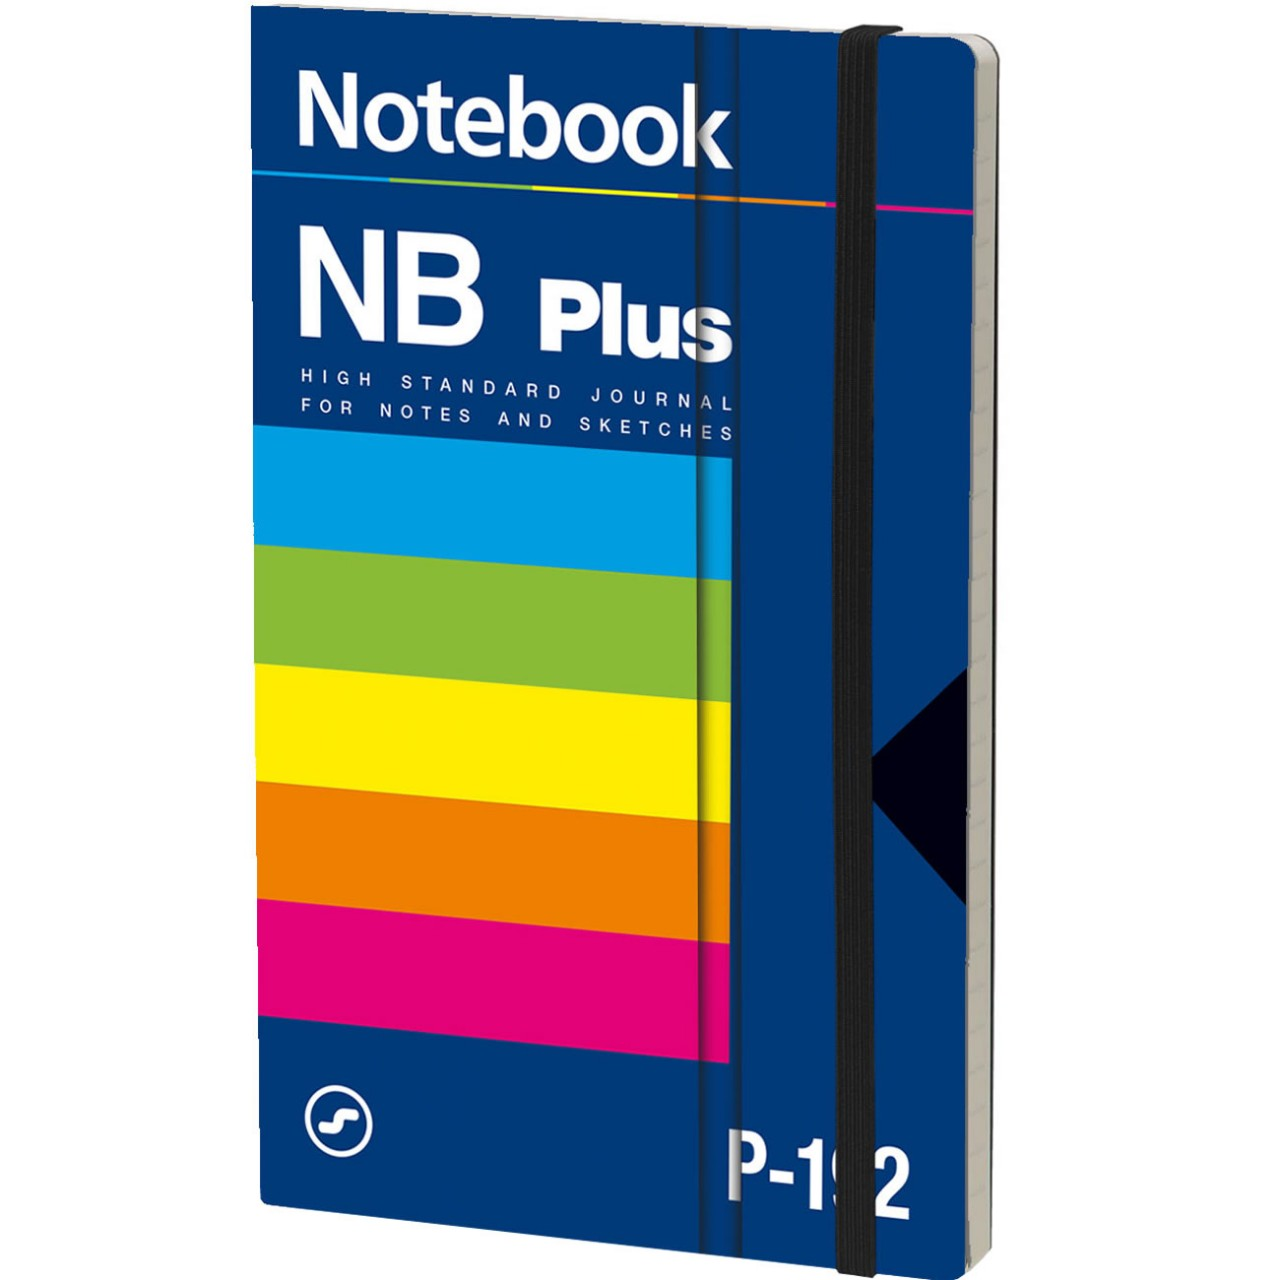 Stifflex Notizbuch VHS 13 x 21 cm 192 S., POLAR PLUS